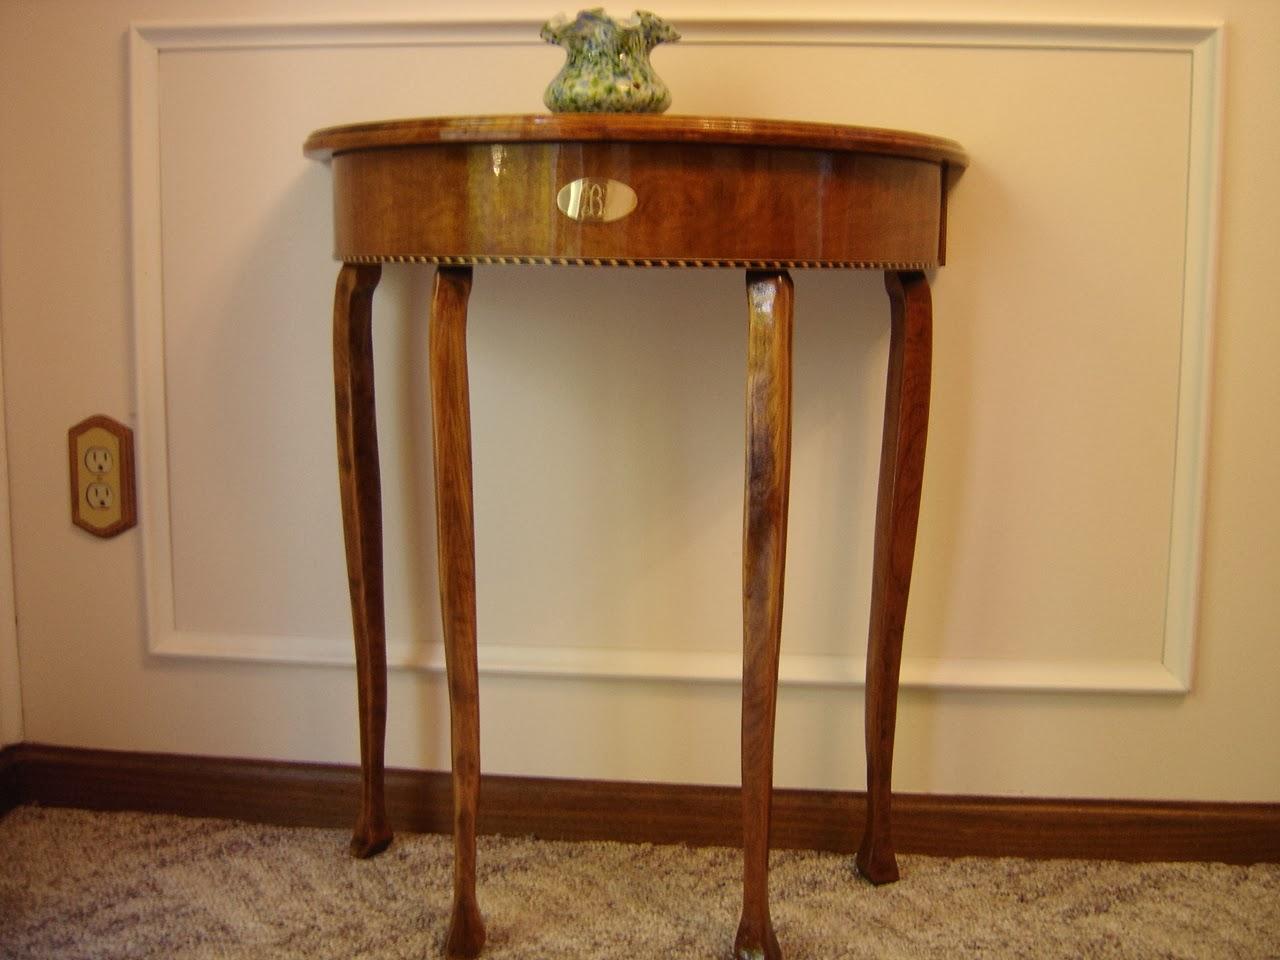 Handmade Furniture With Care Demi Luna Small Half Round Table